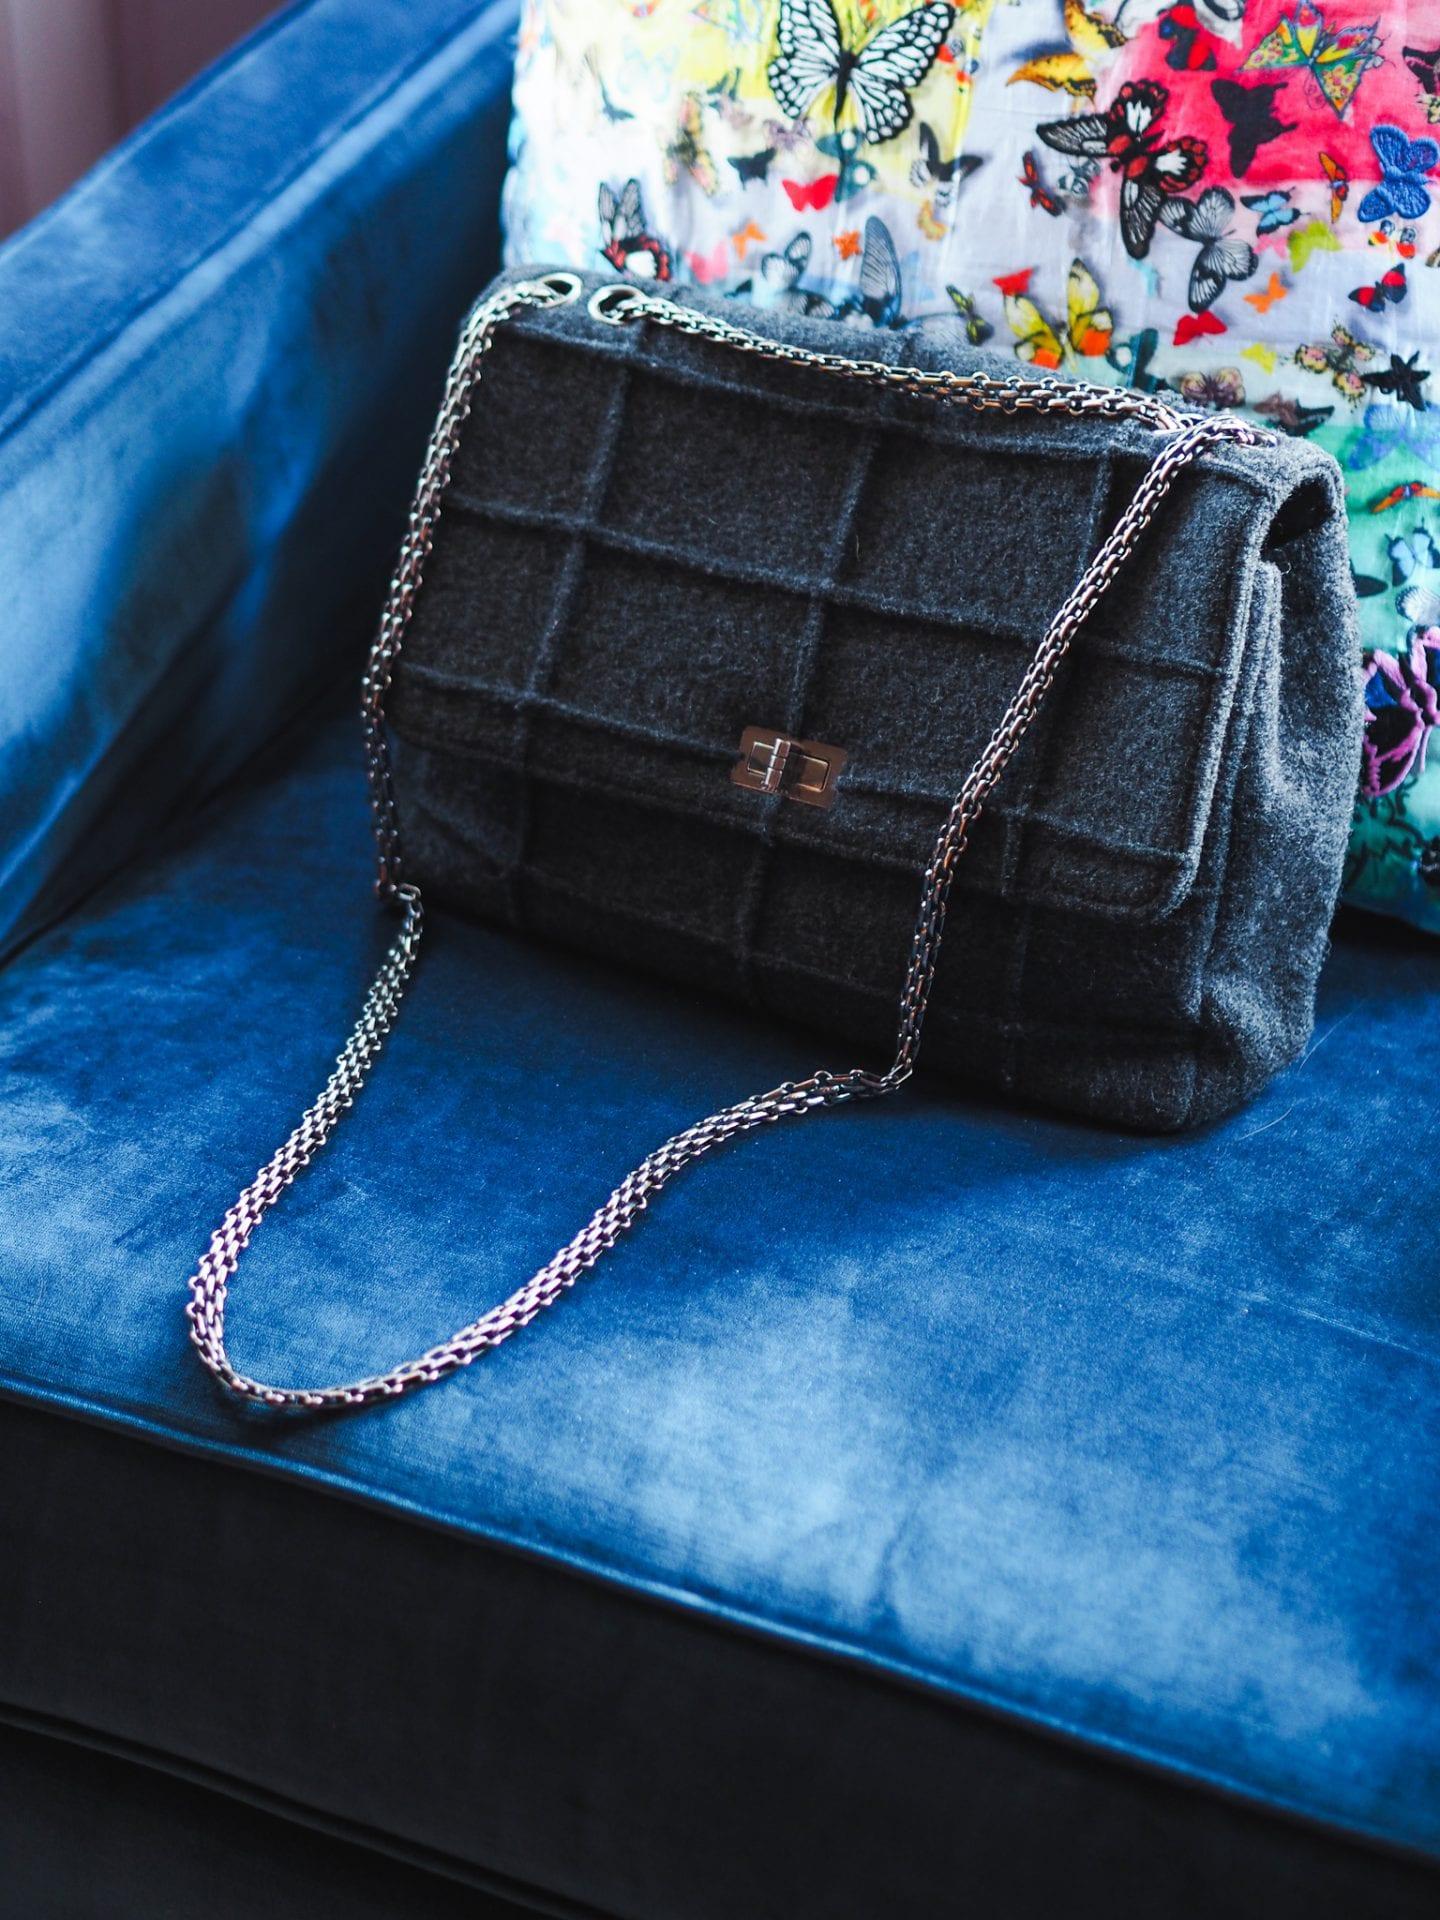 chanel reissue handbag 1999 vintage grey millenium handbag bag silver hardware